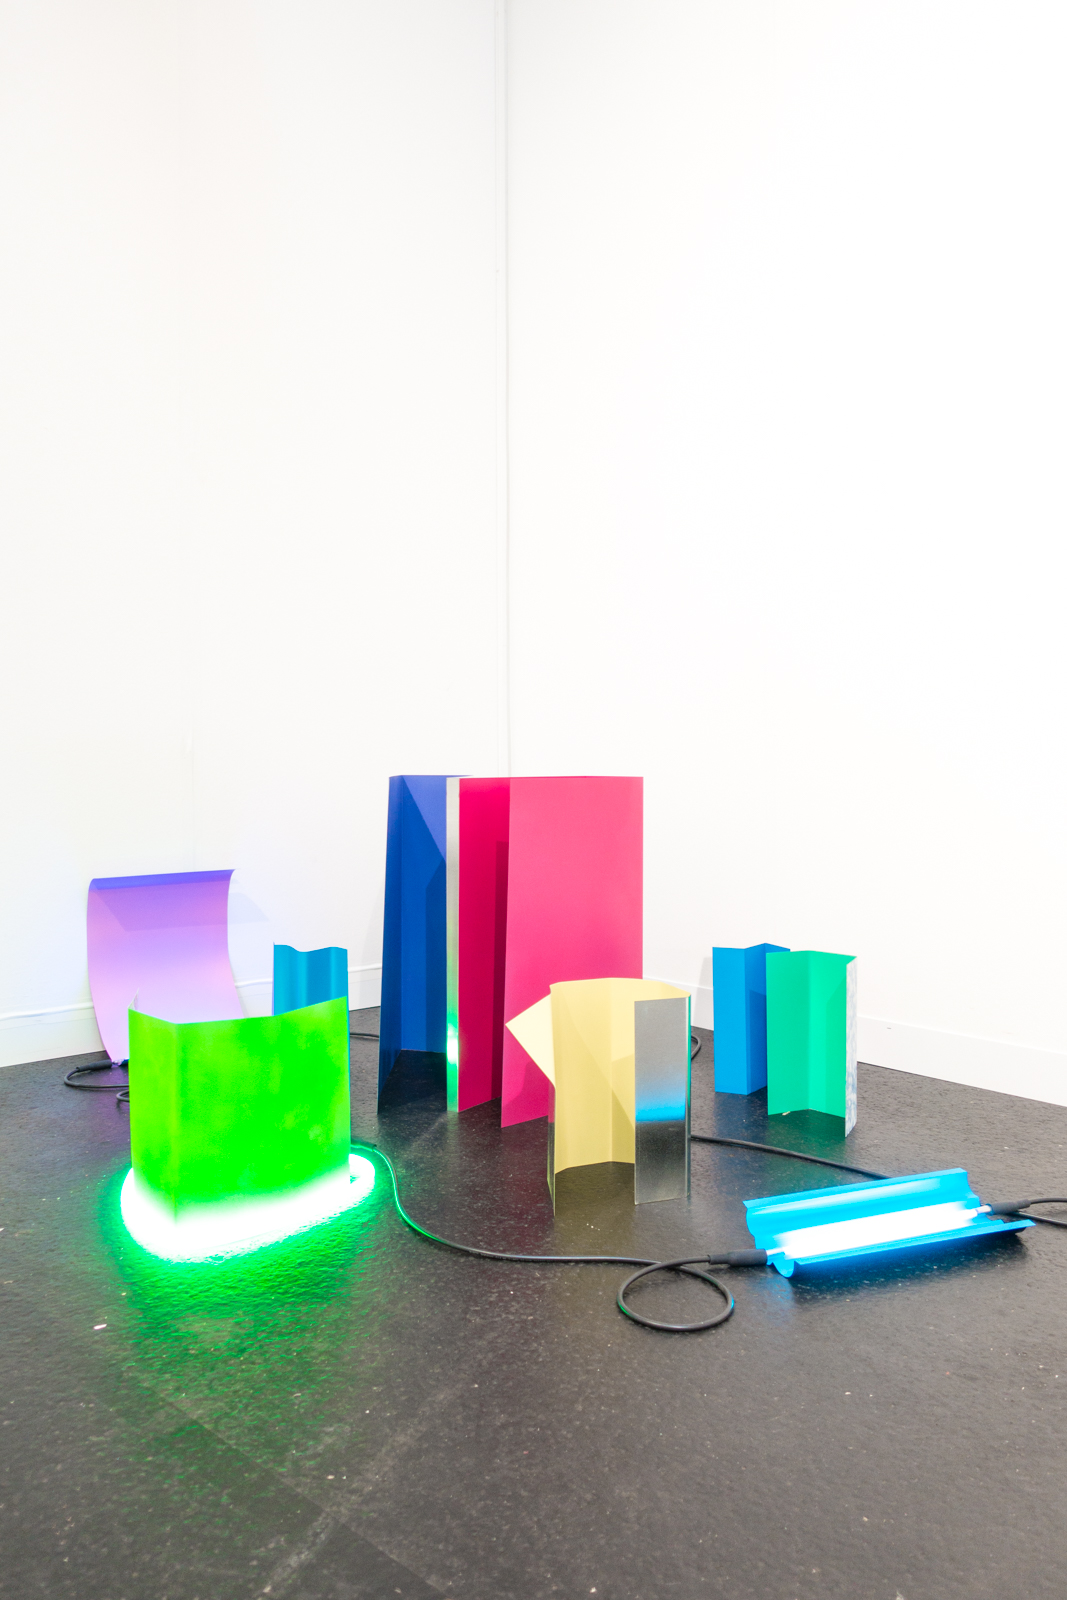 Michael Vickers, Neon, 2016